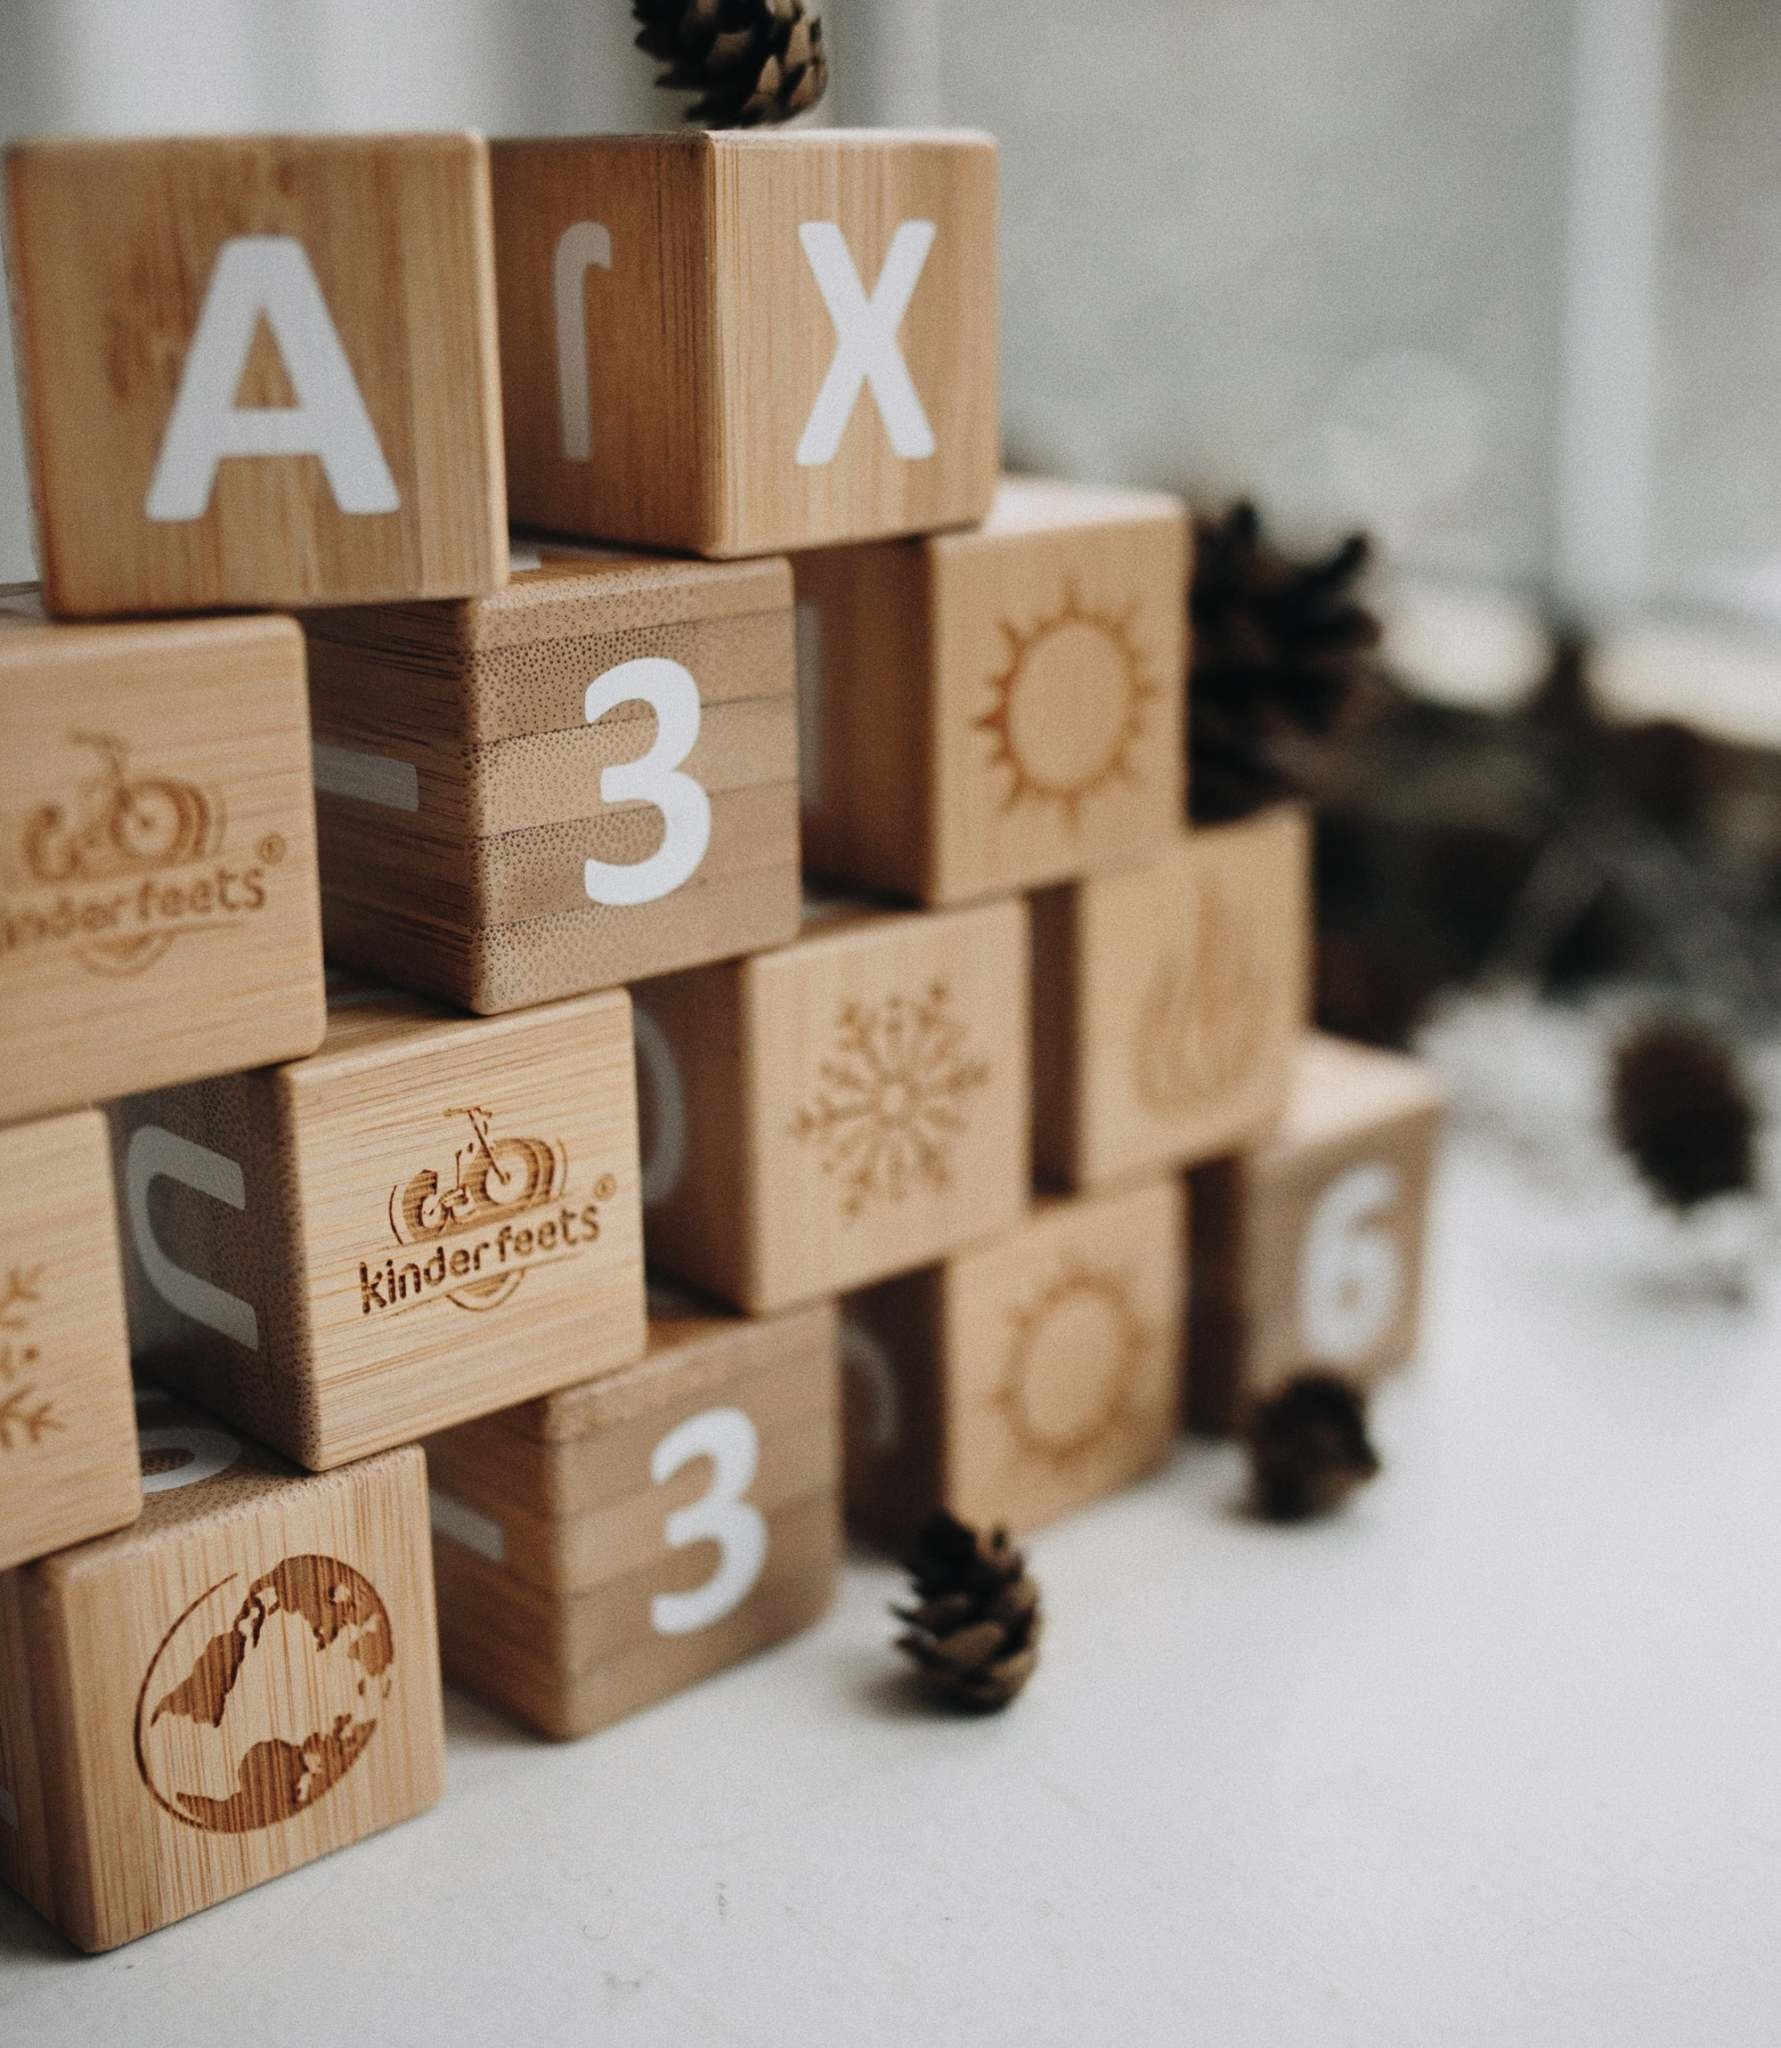 Kinderfeets Kinderfeets ABC Bamboo Blocks